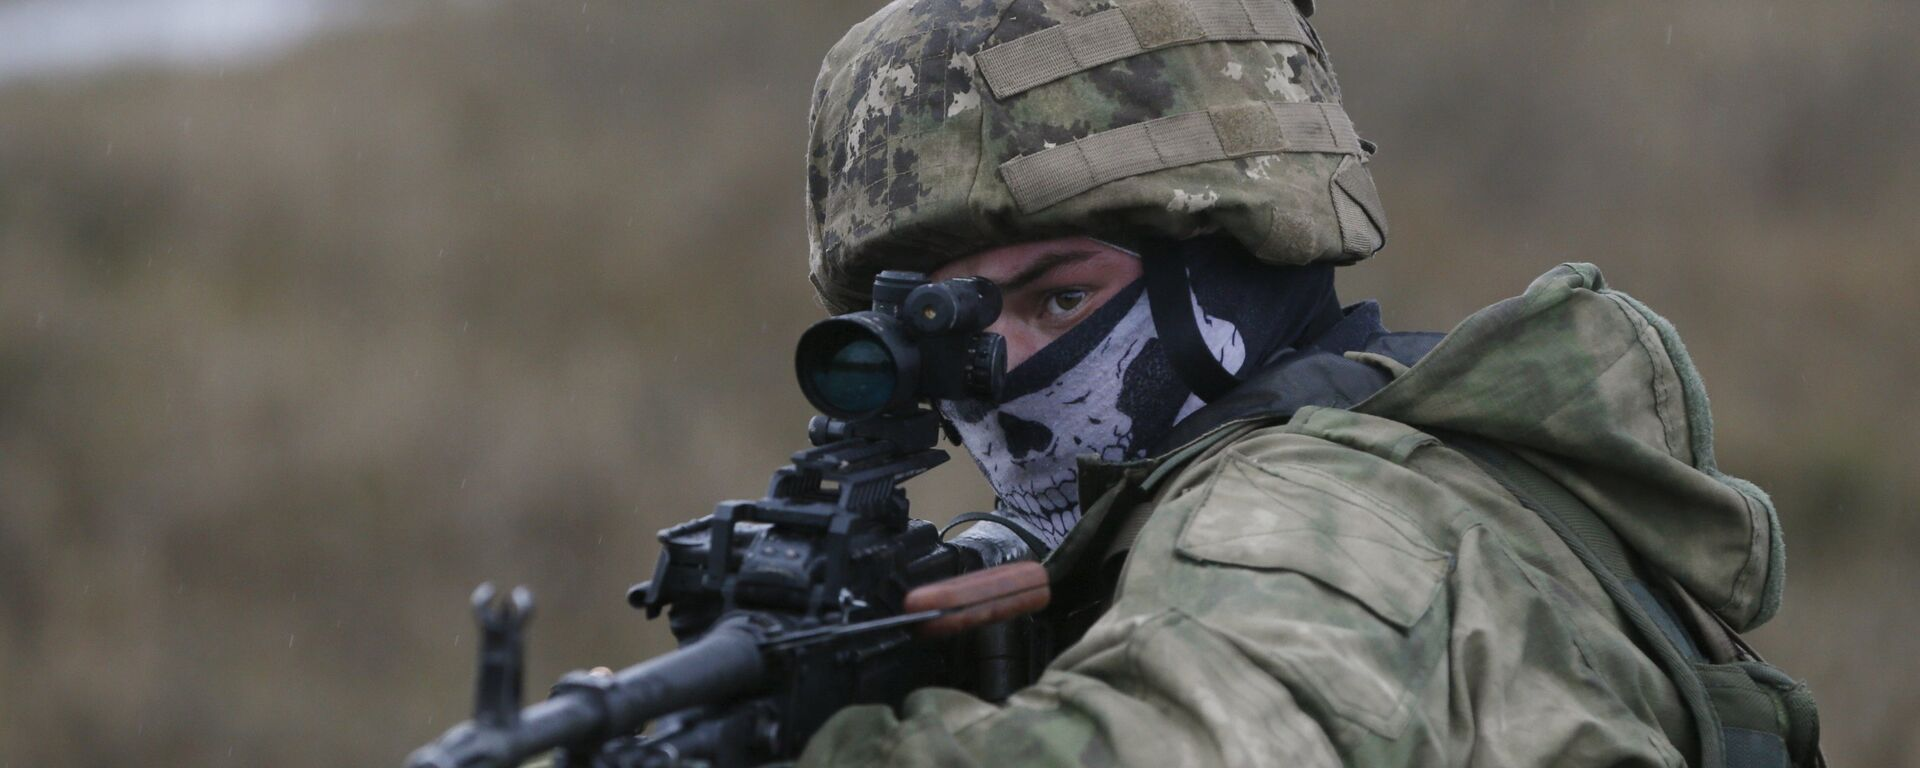 A serviceman of Ukrainian special operation forces takes part in tactical exercises at a shooting range in Khmelnytsky region, Ukraine November 20, 2015. - Sputnik Mundo, 1920, 11.06.2021